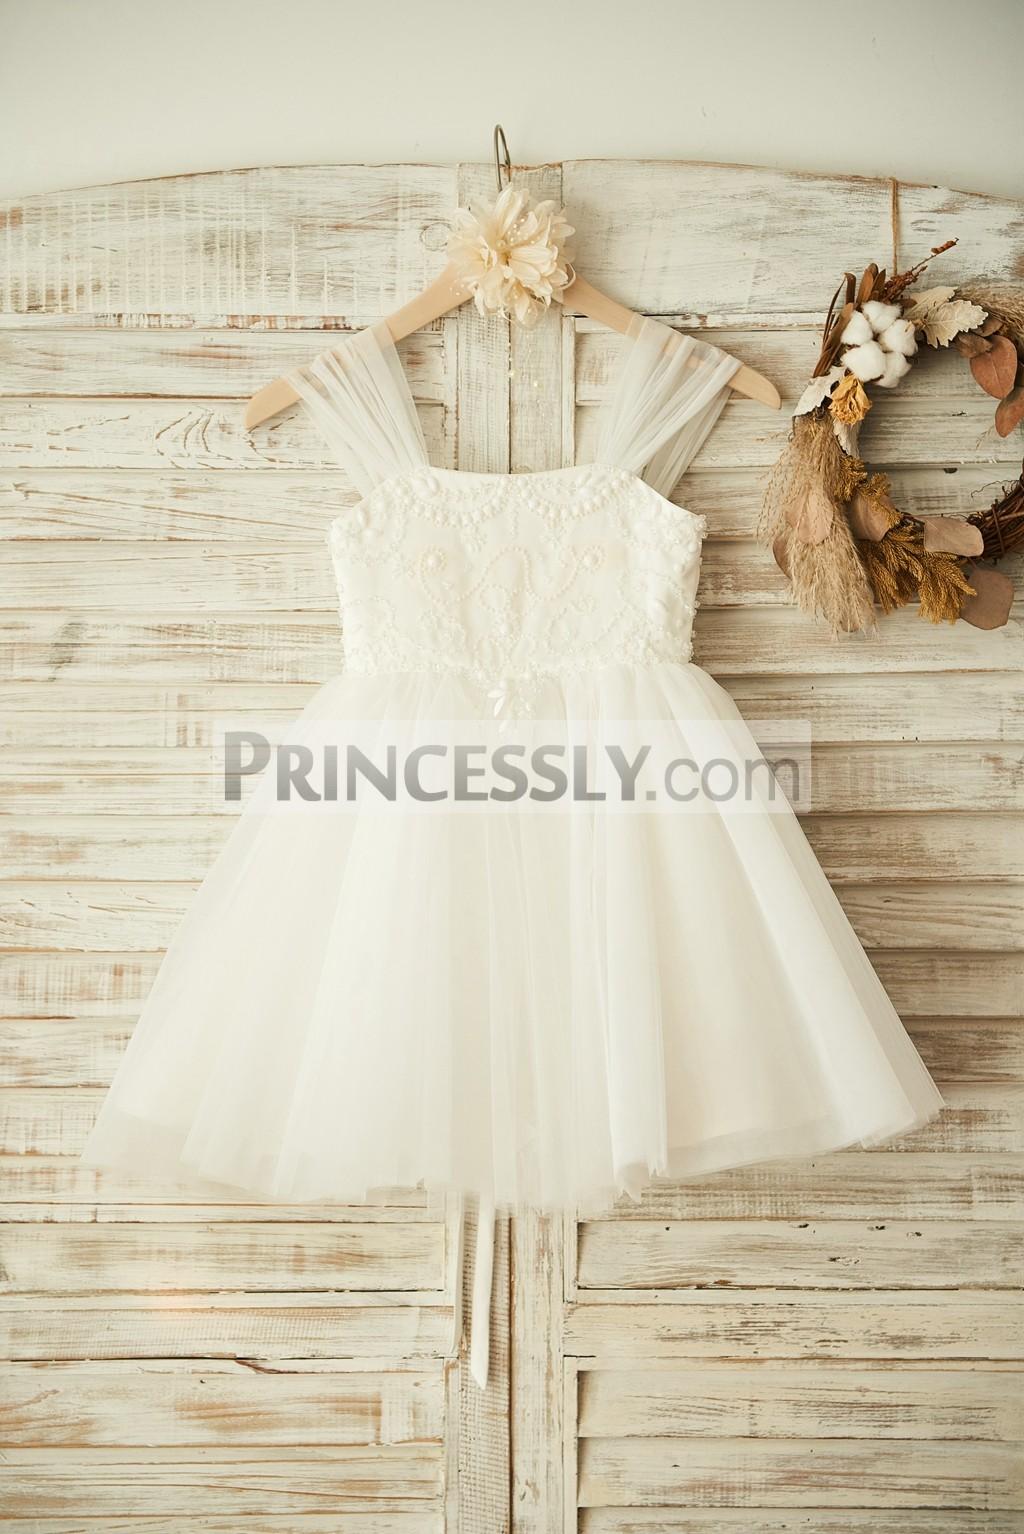 cd70084a99 Boho Beach Lace-up Back Ivory Tulle Beaded Flower Girl Dress